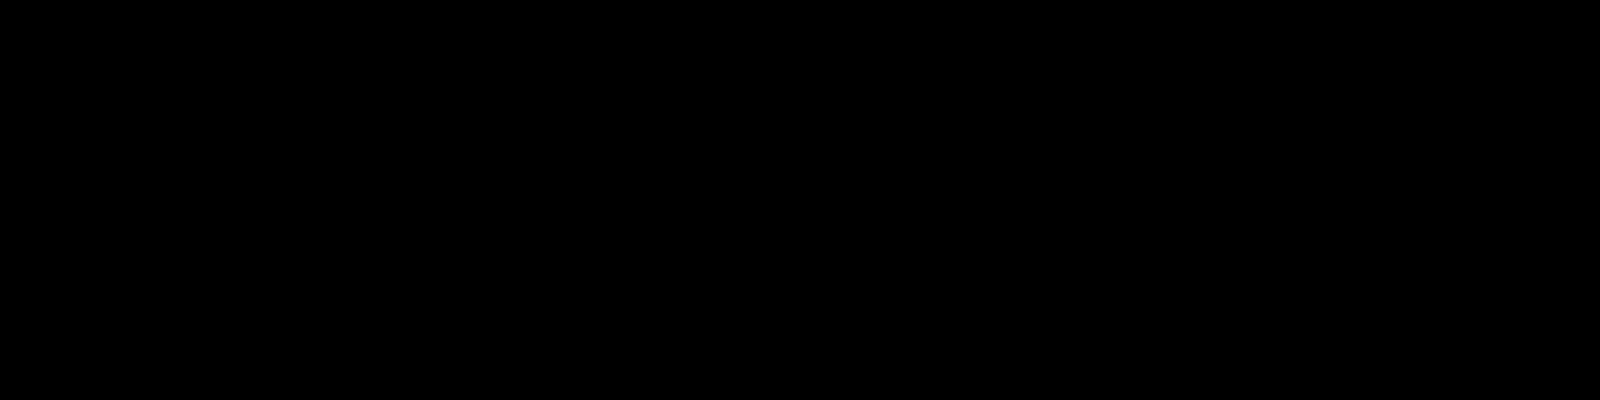 Vetsak